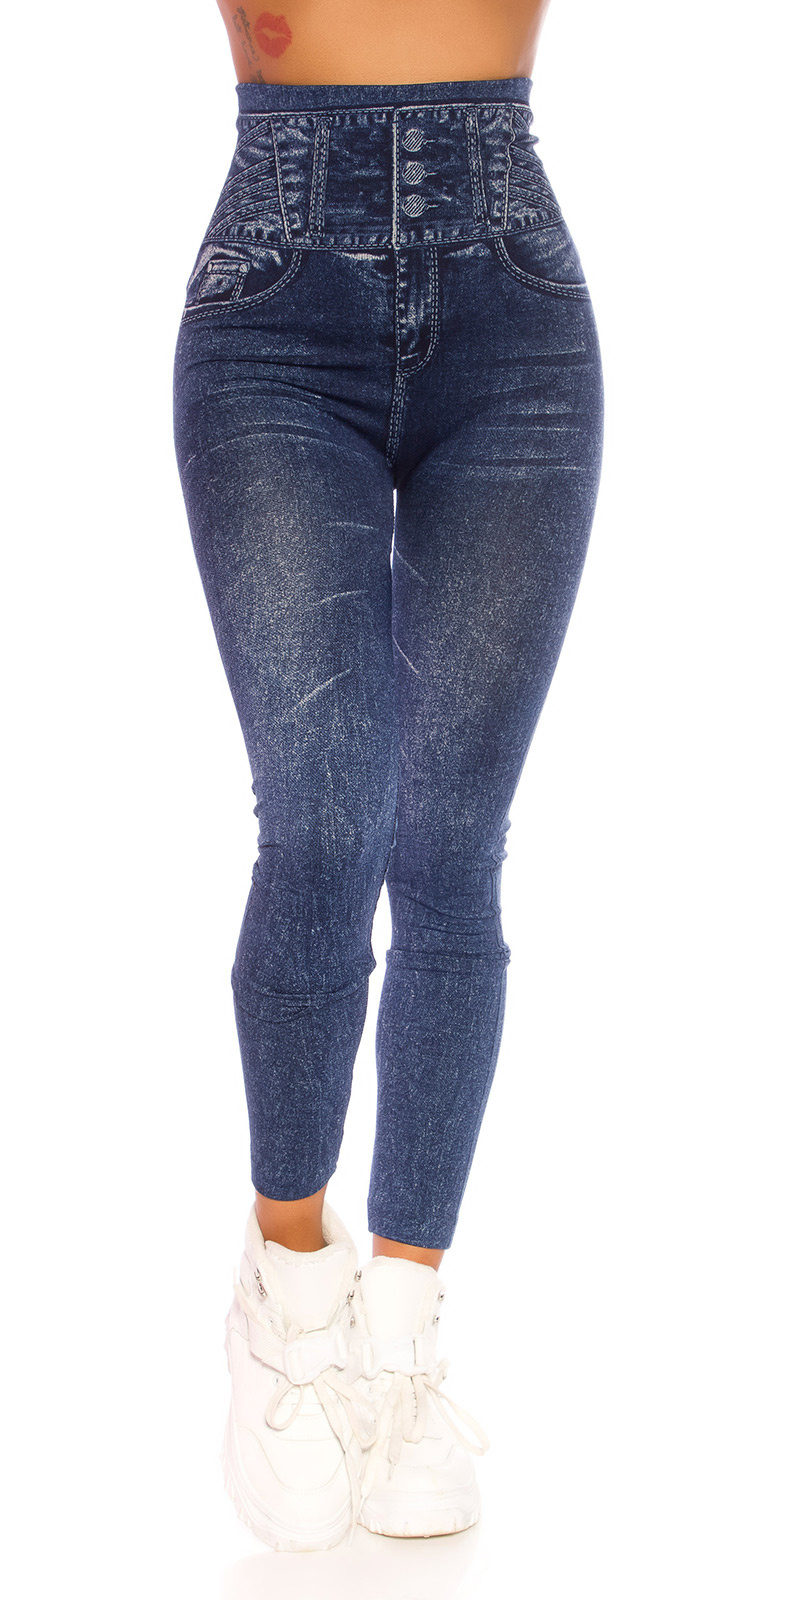 Trendy hoge taille jeanslook leggings blauw